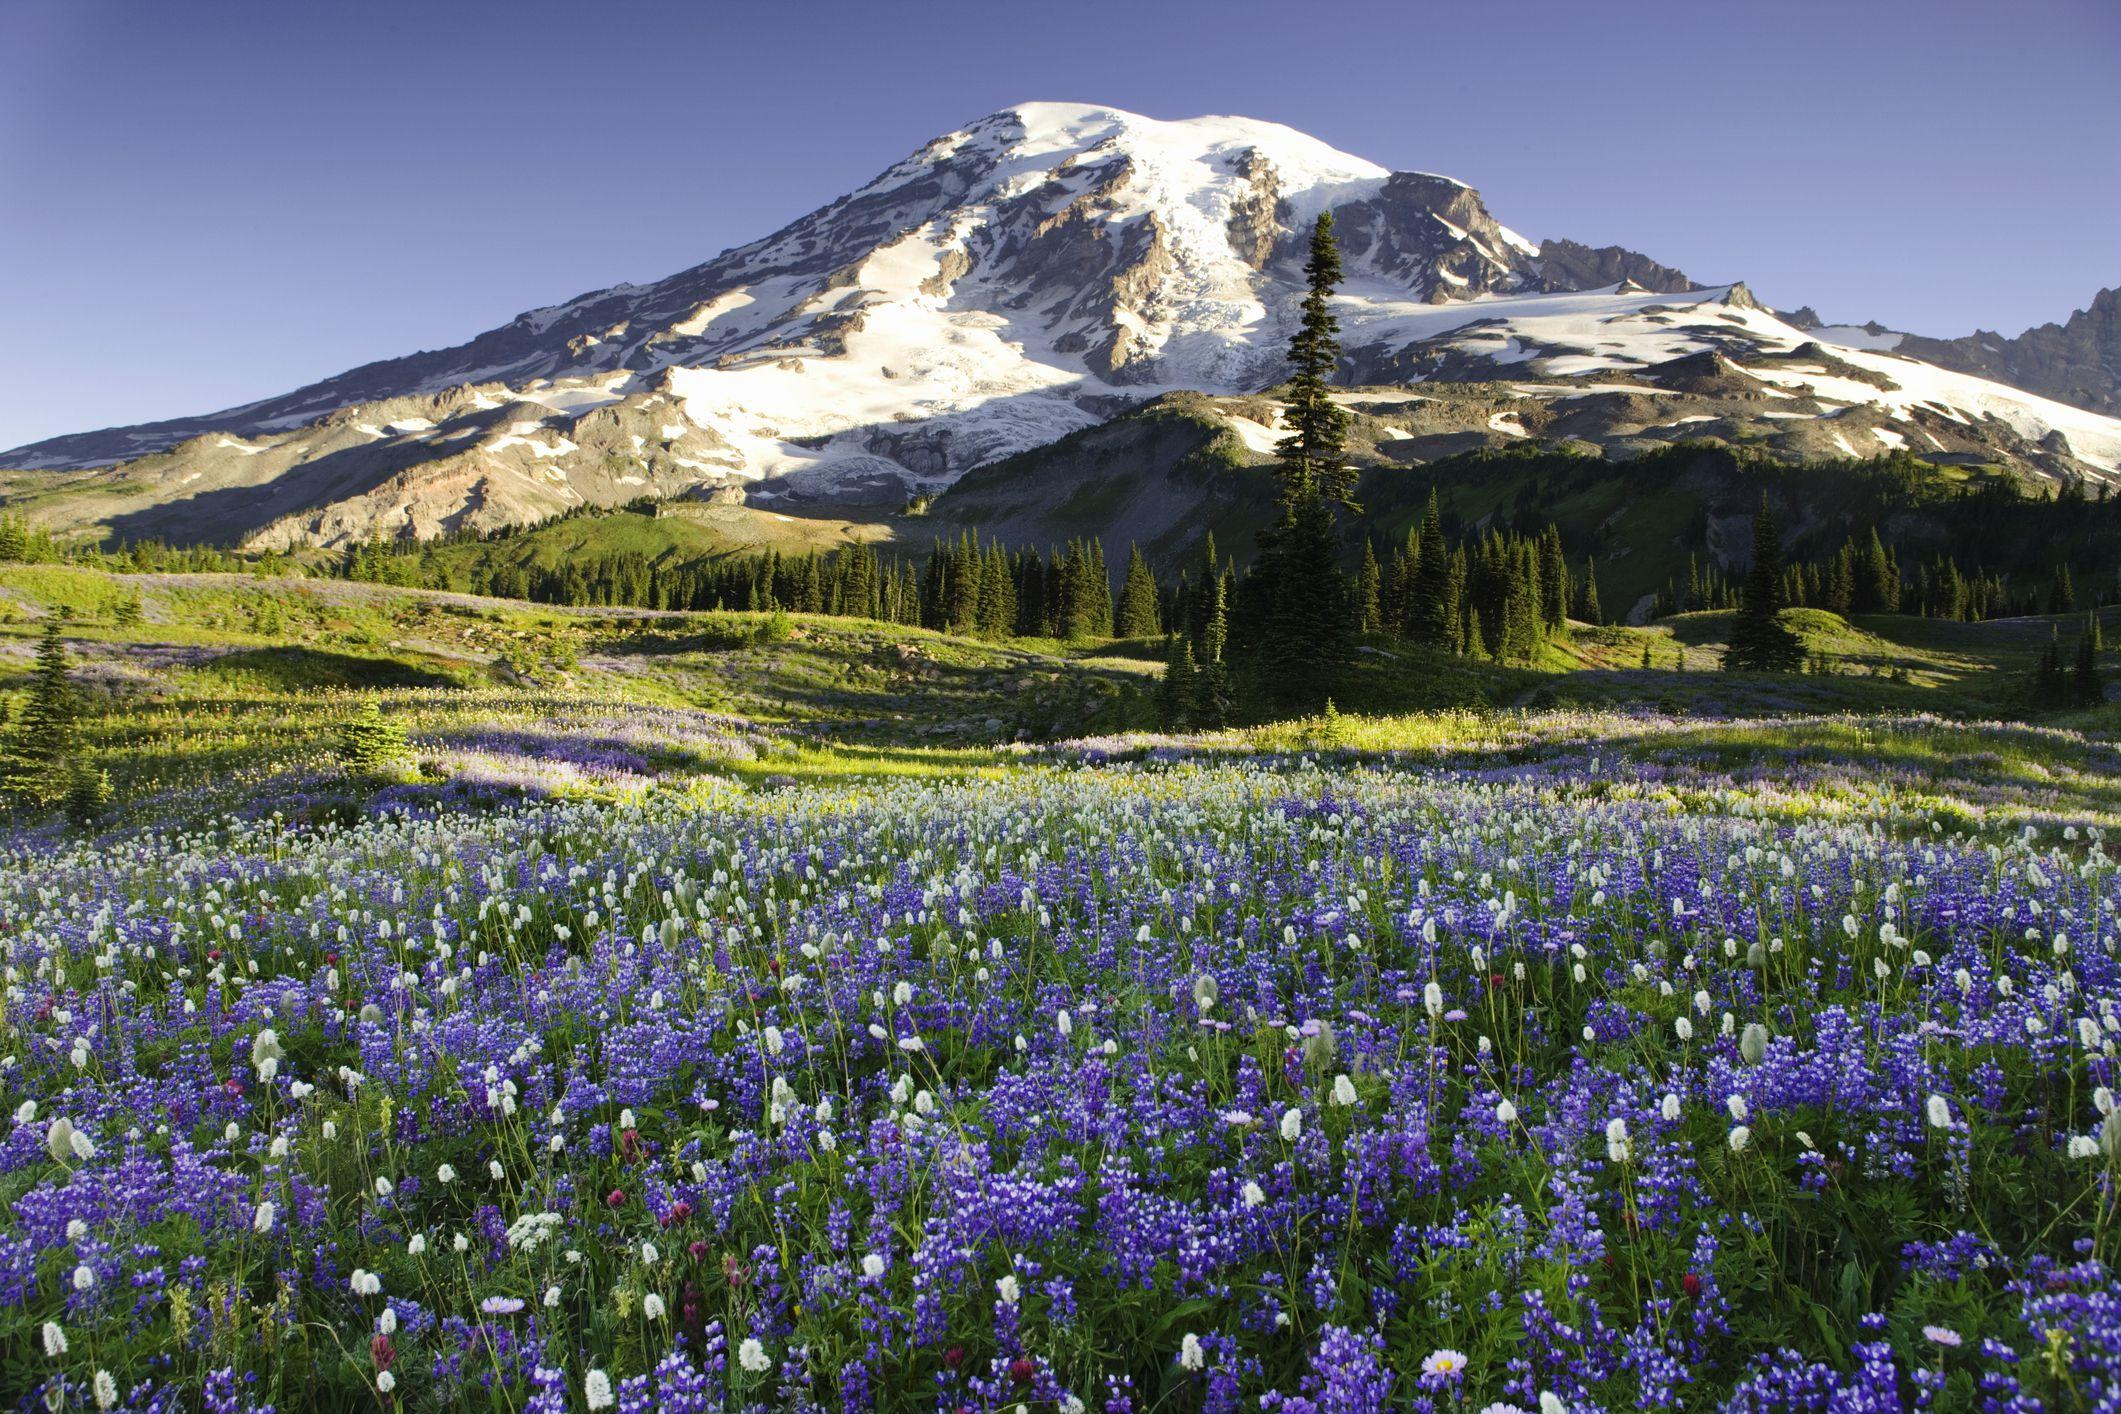 USA, Washington, Mt. Rainier National Park, field with wildflowers